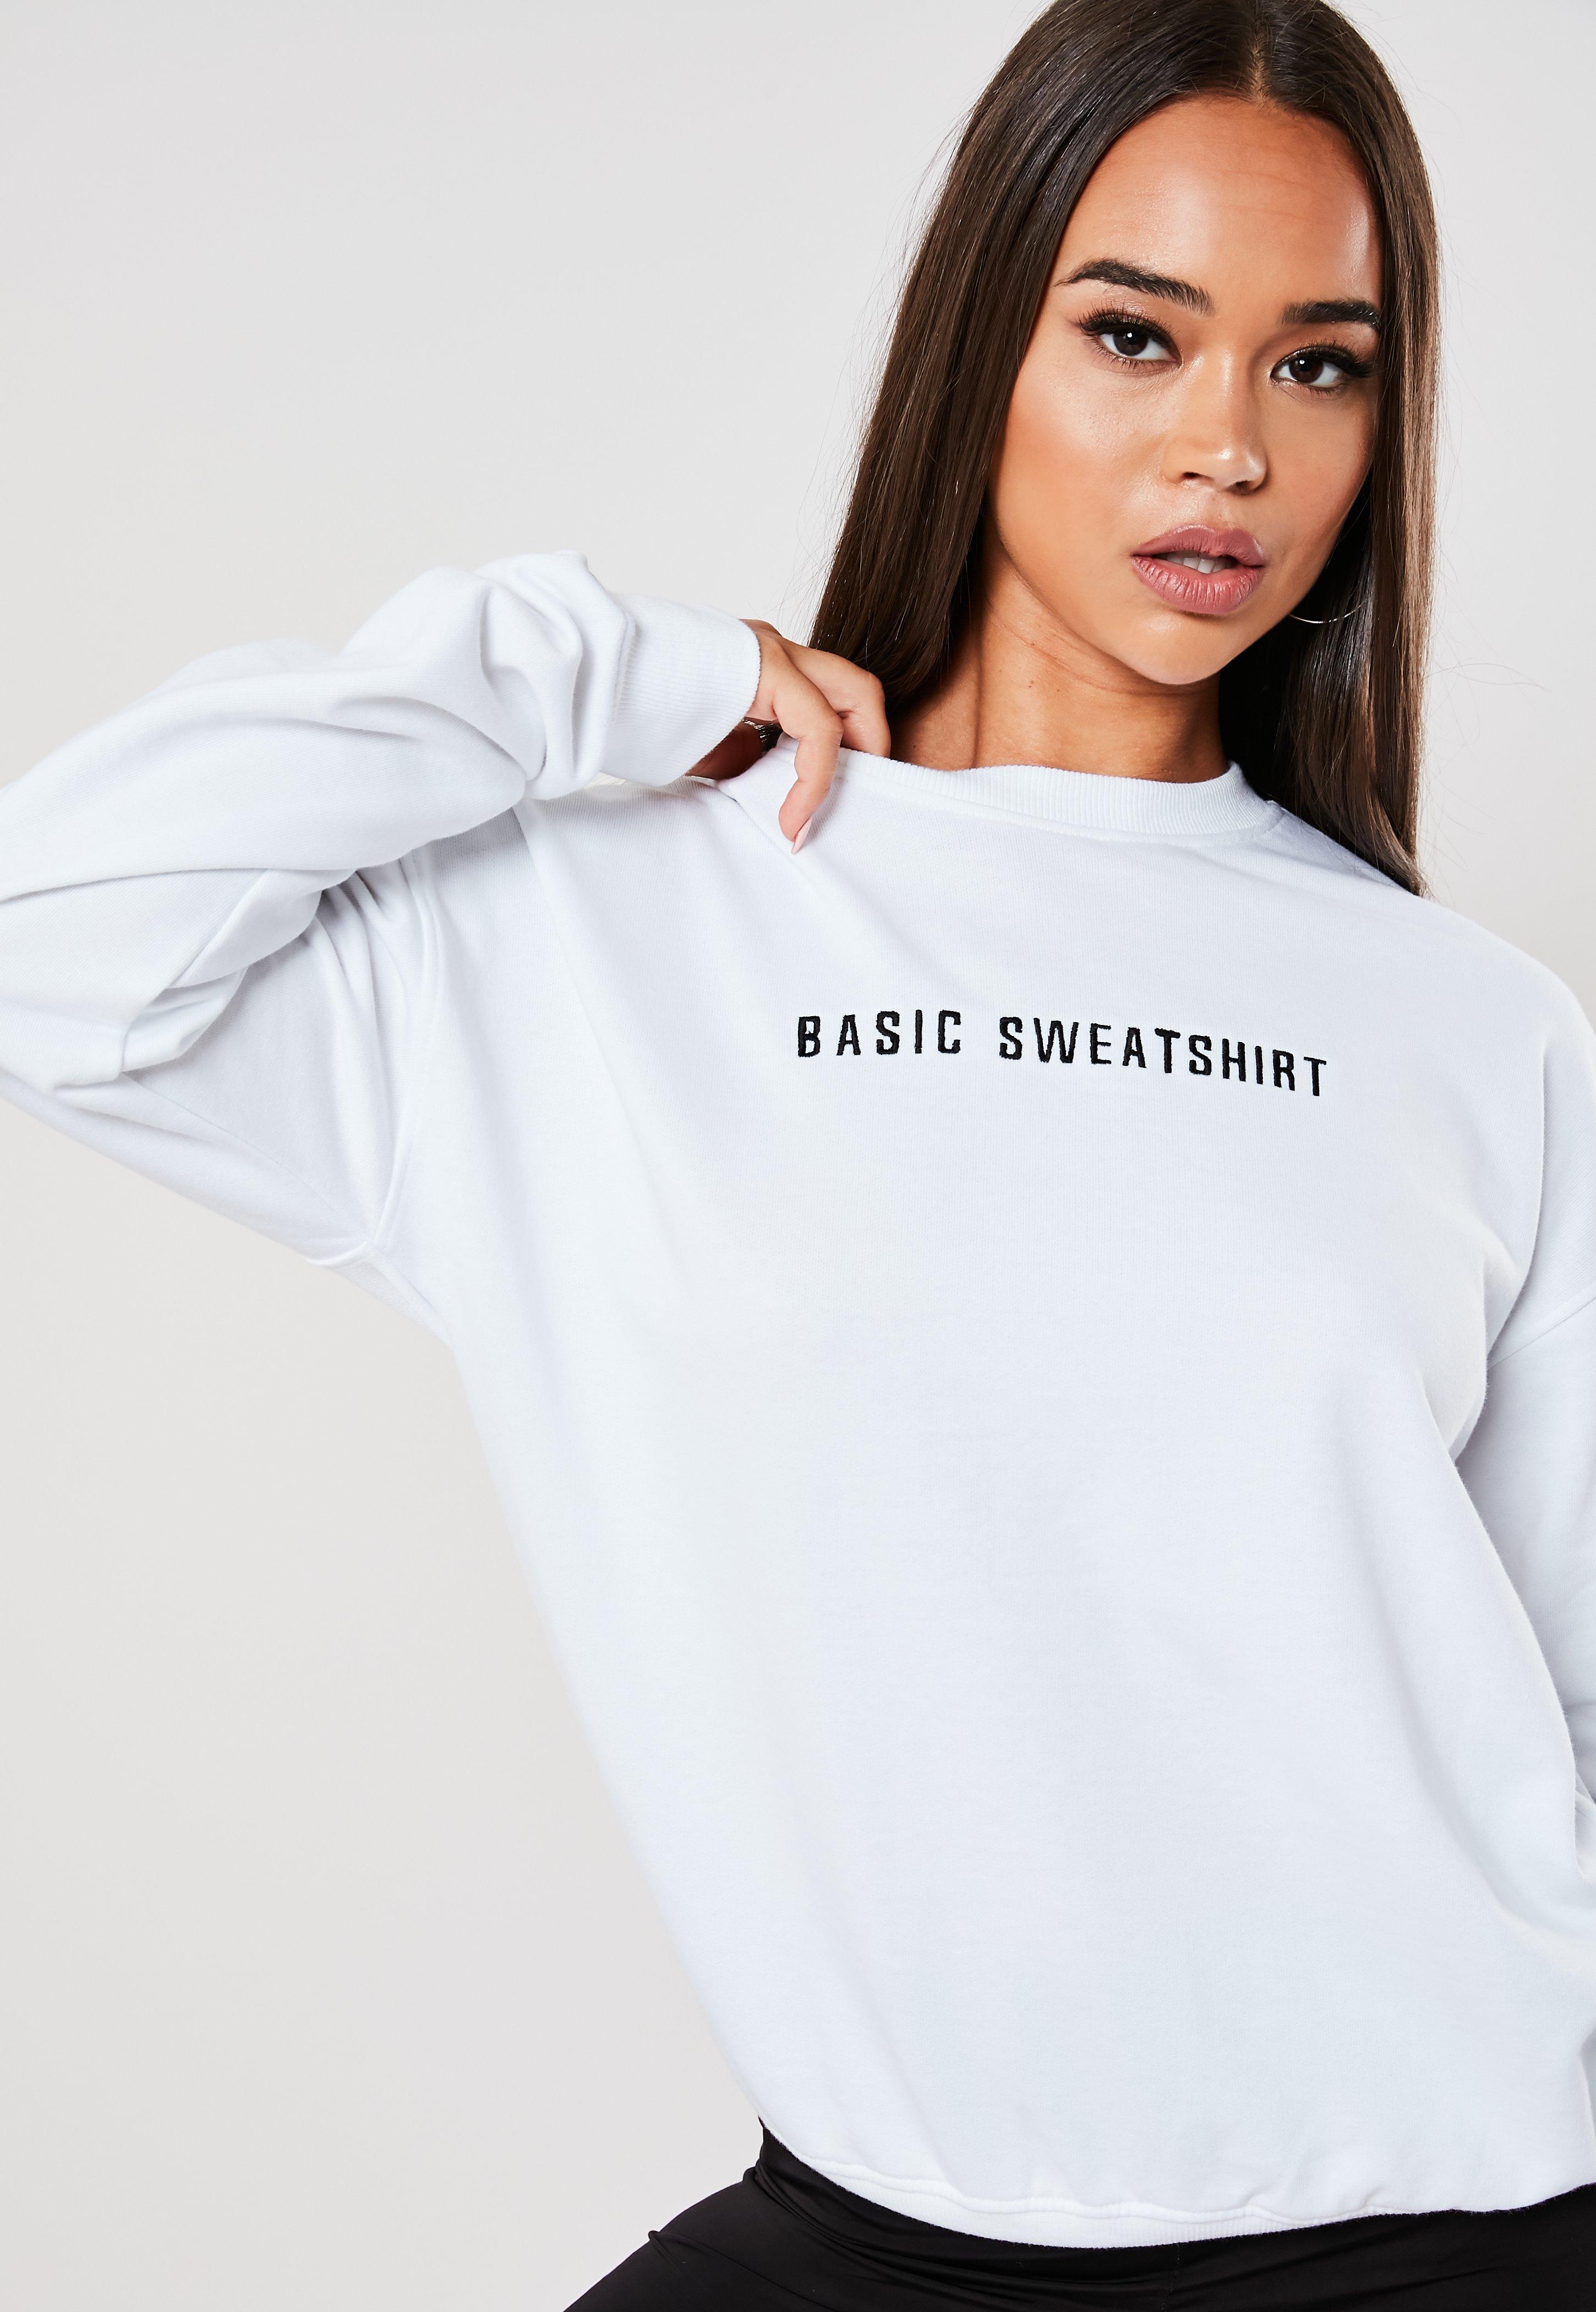 b9fd563f1 White Embroidered Basic Sweatshirt